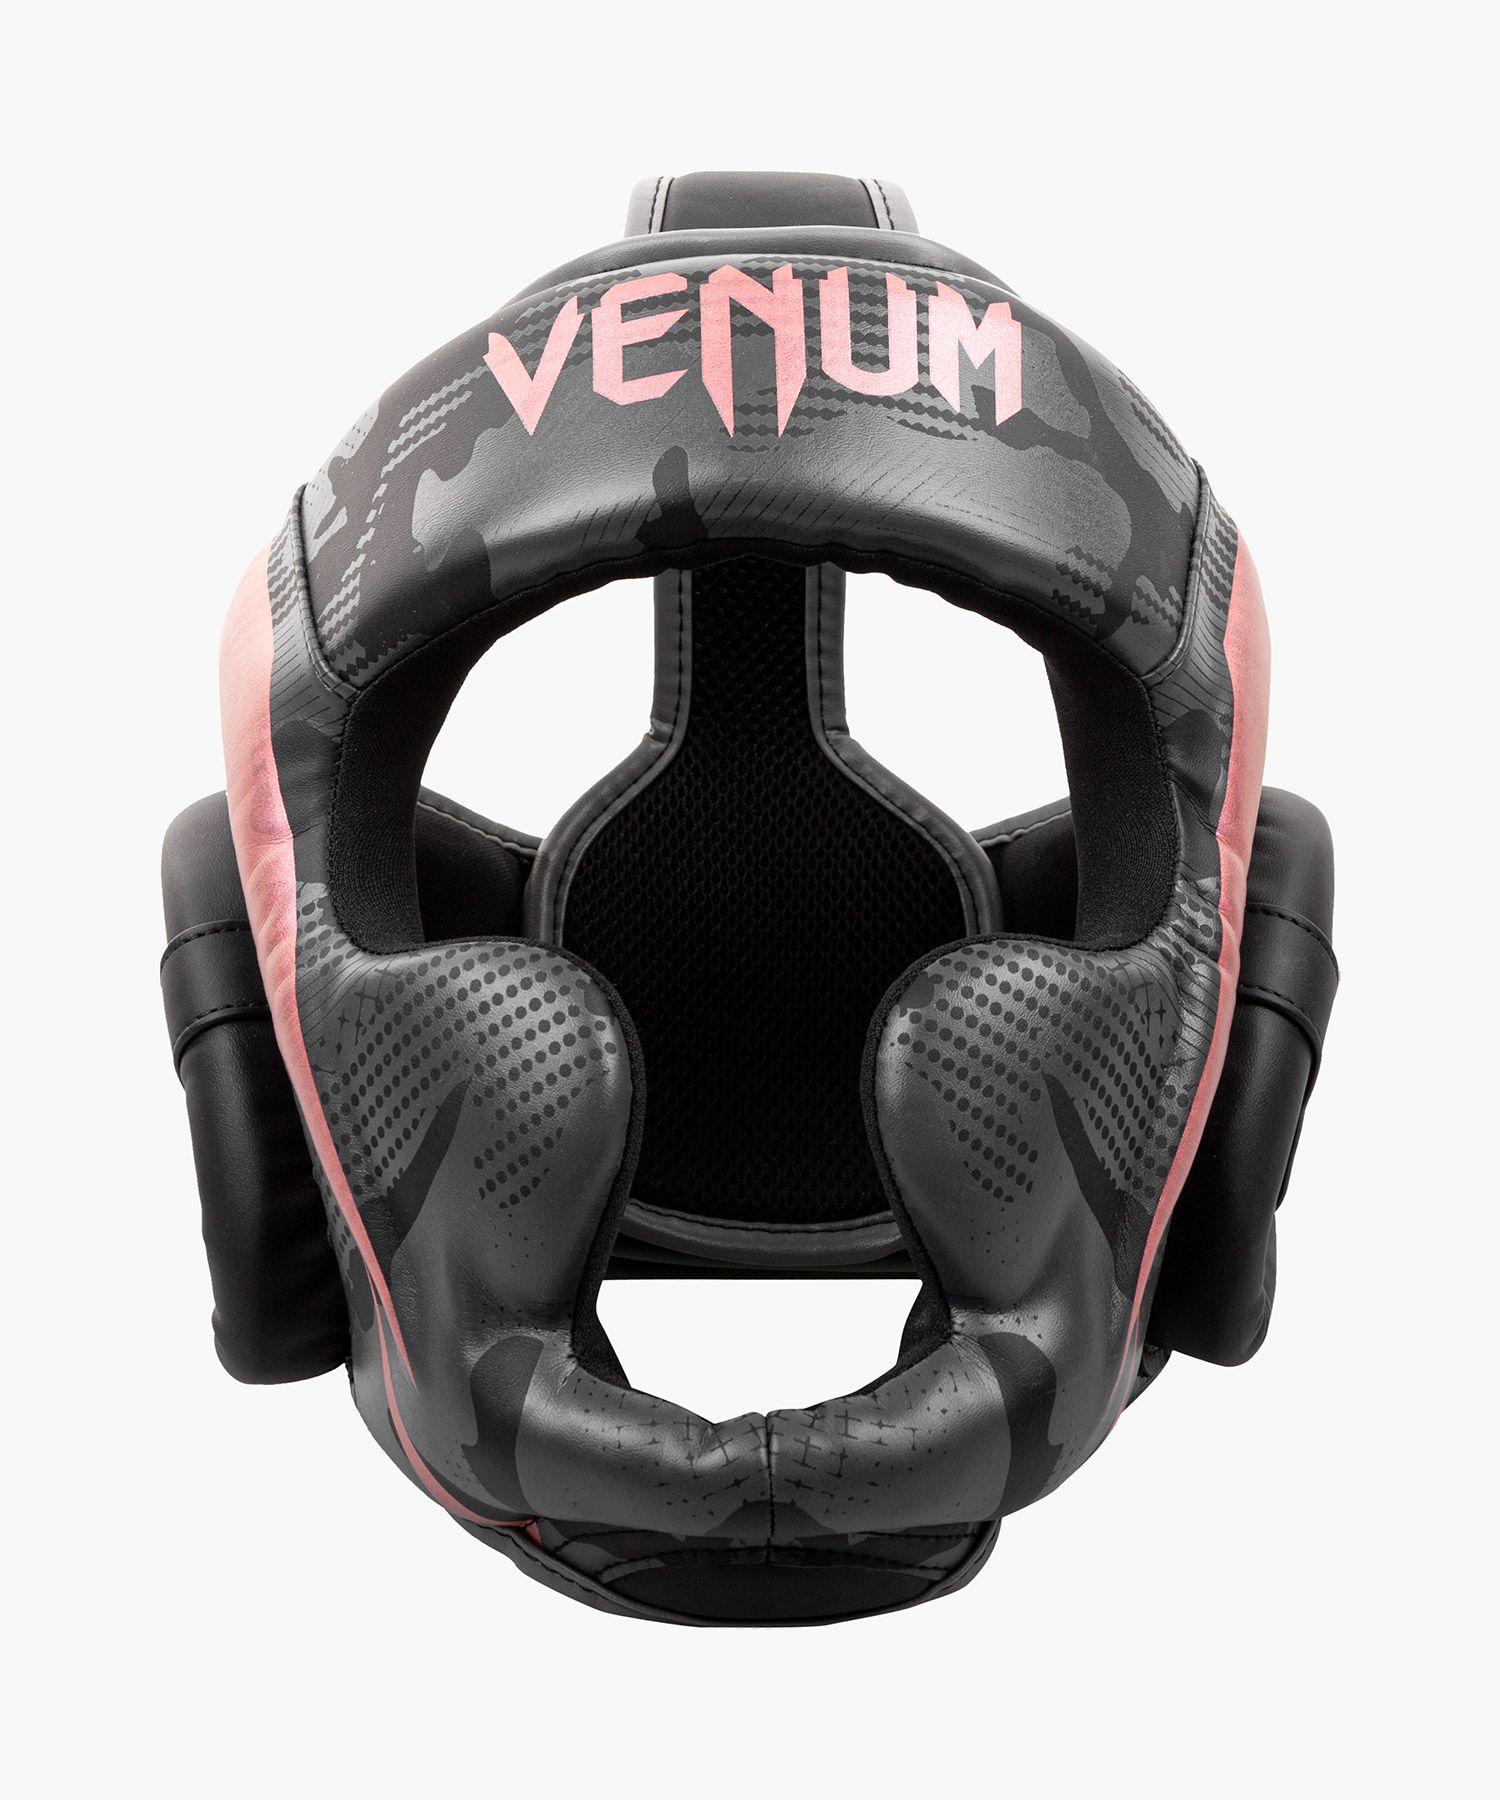 Venum Elite Kopfschutz - Schwarz/Rosagold